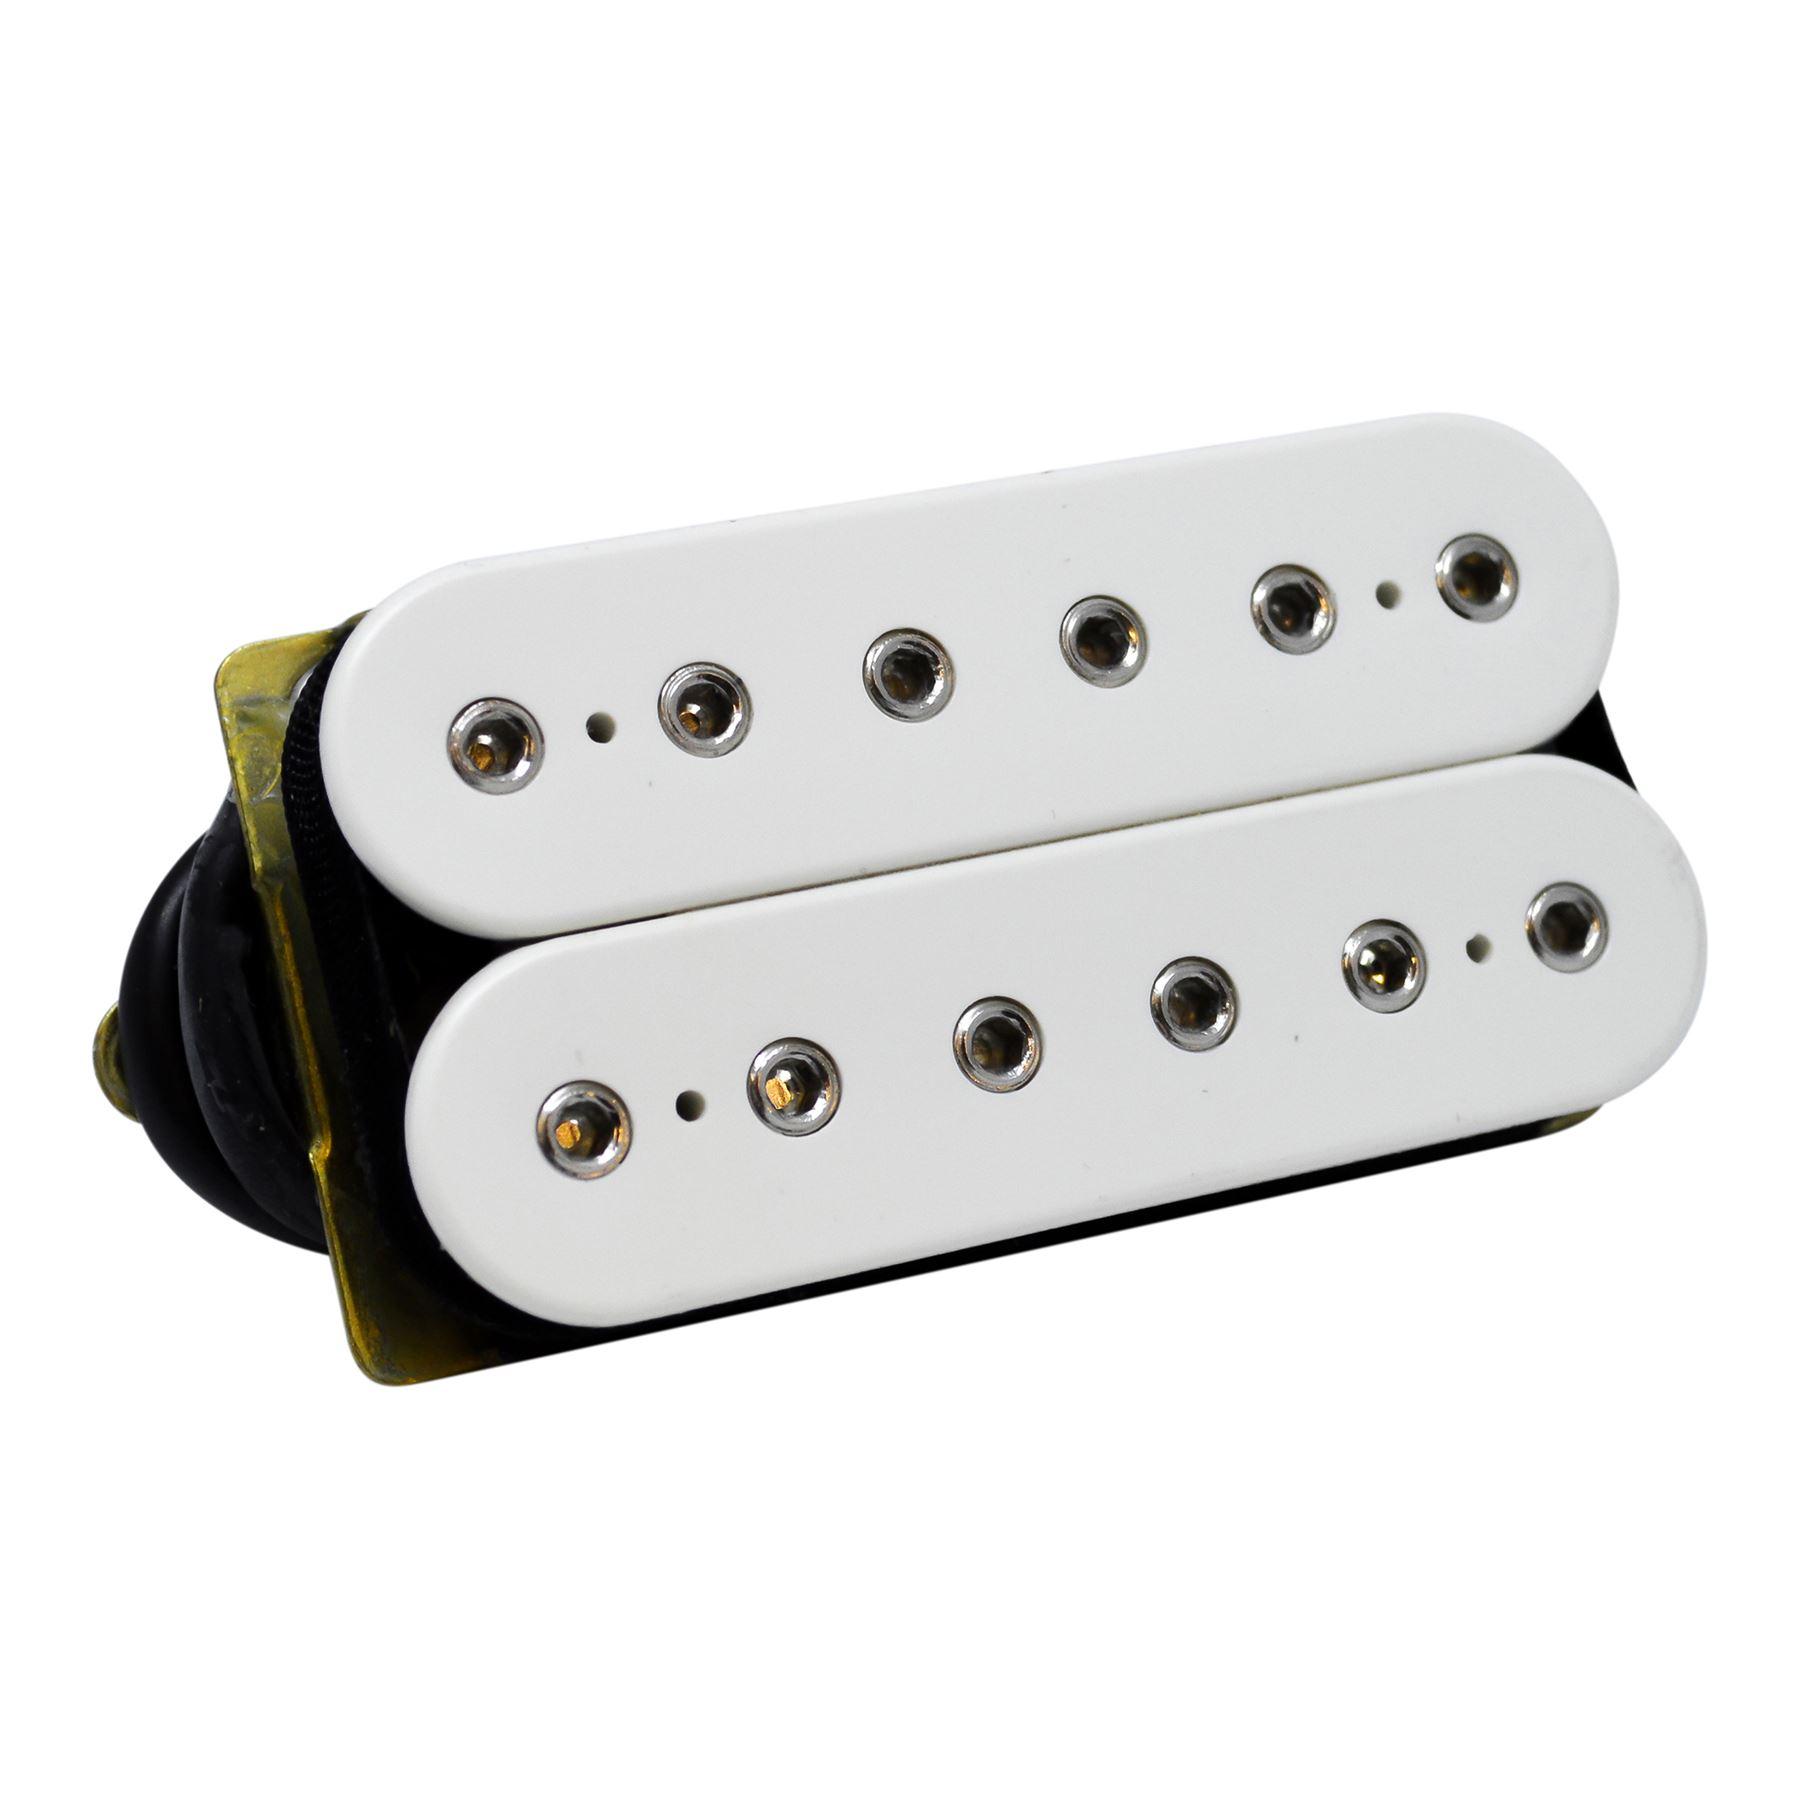 Dimarzio Super Distortion Humbucker Guitar Pickup F Spaced White Hot Wire Wiring Sd100